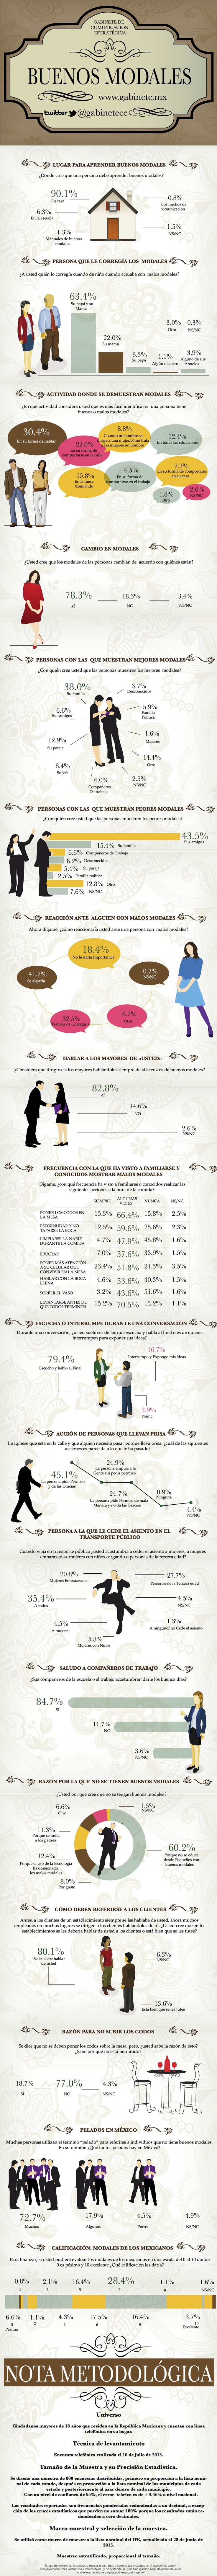 Los buenos modales #infografia #infographic #education